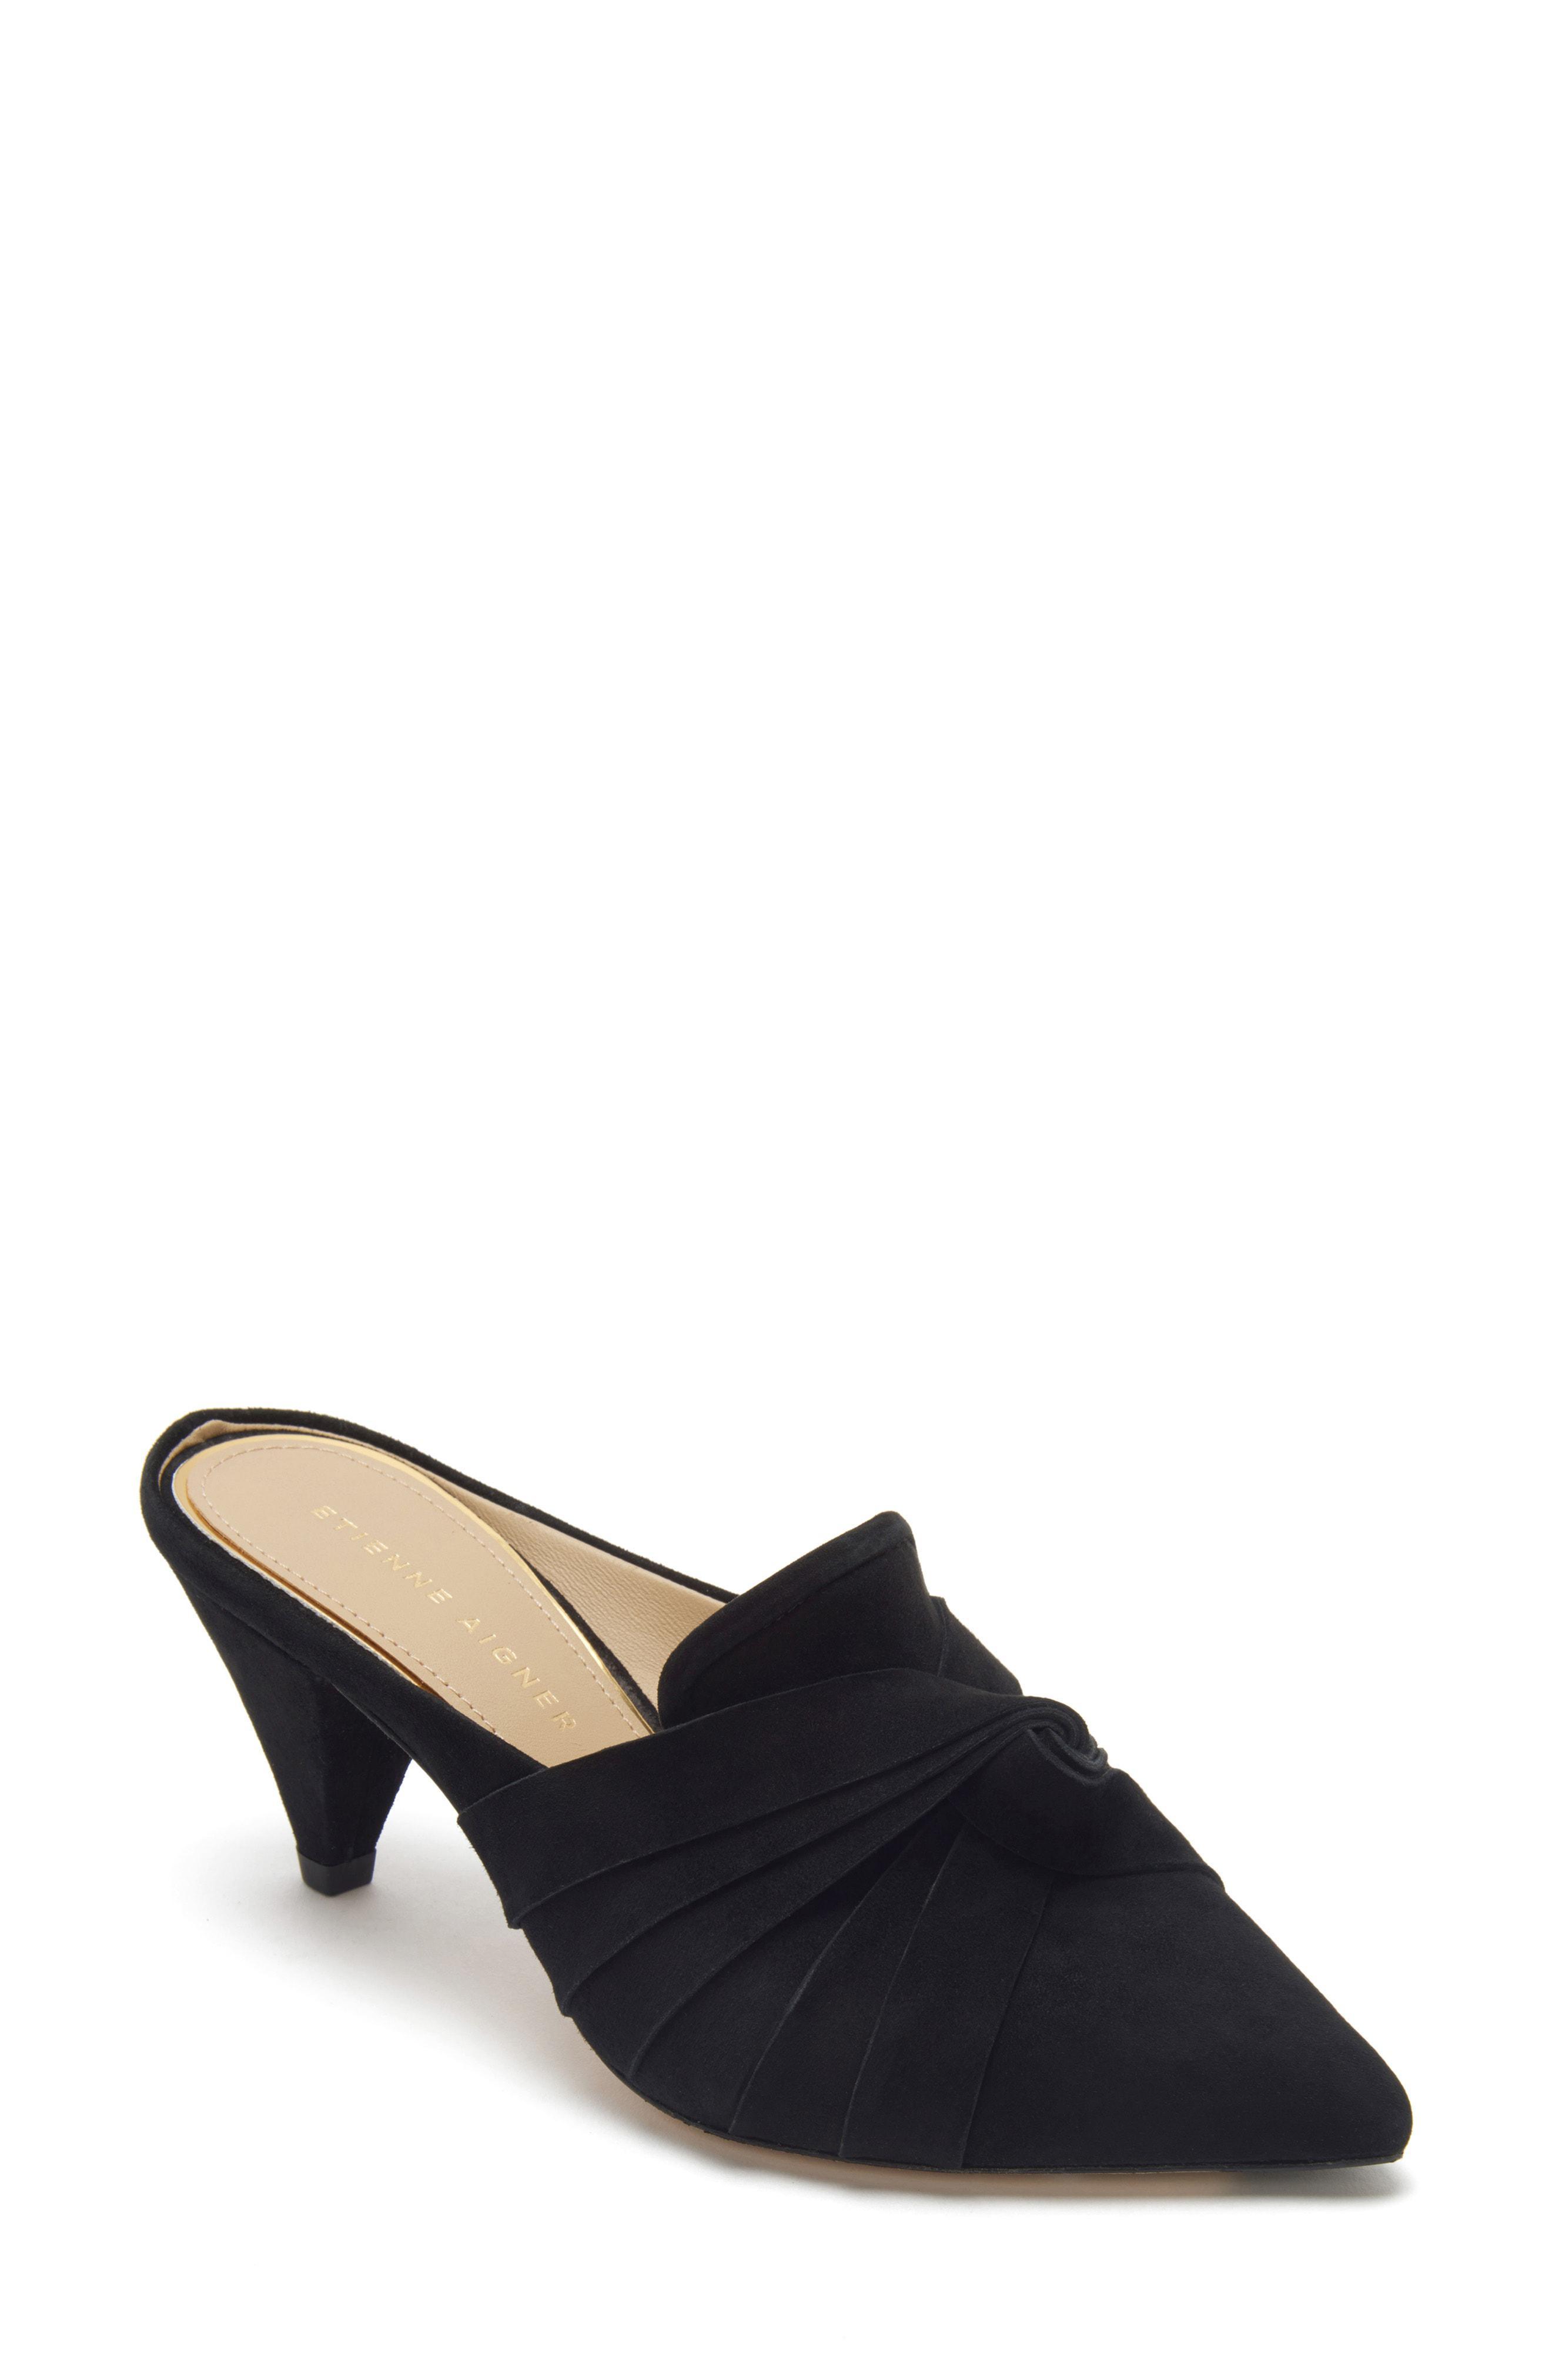 9e8b78a55c8a Lyst - Etienne Aigner Pavana Suede Dress Mules in Black